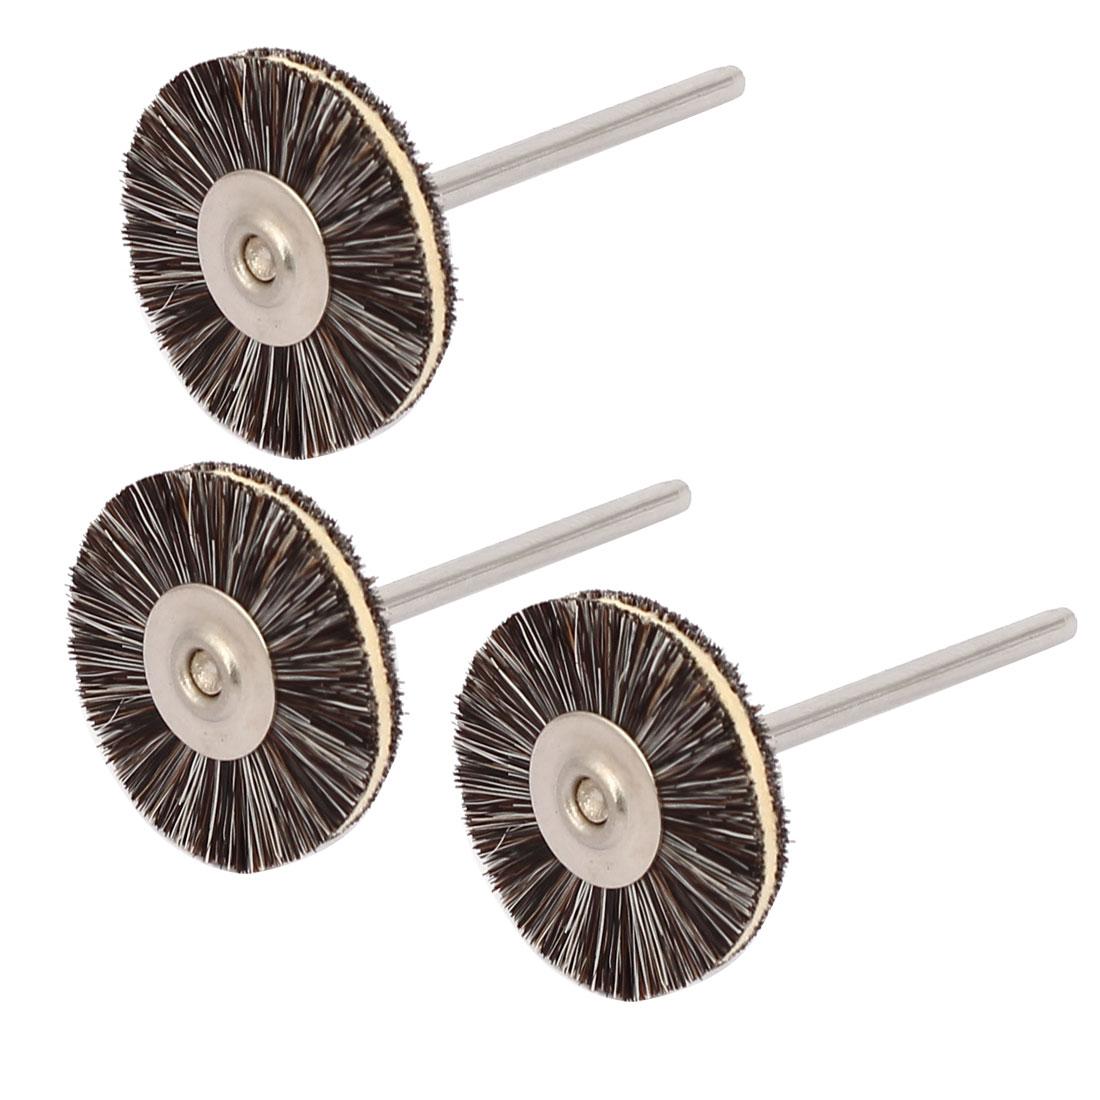 2.35mm Dia Shank 22mm Round Head Bristle Faux Cowhide Polishing Brushes 3pcs